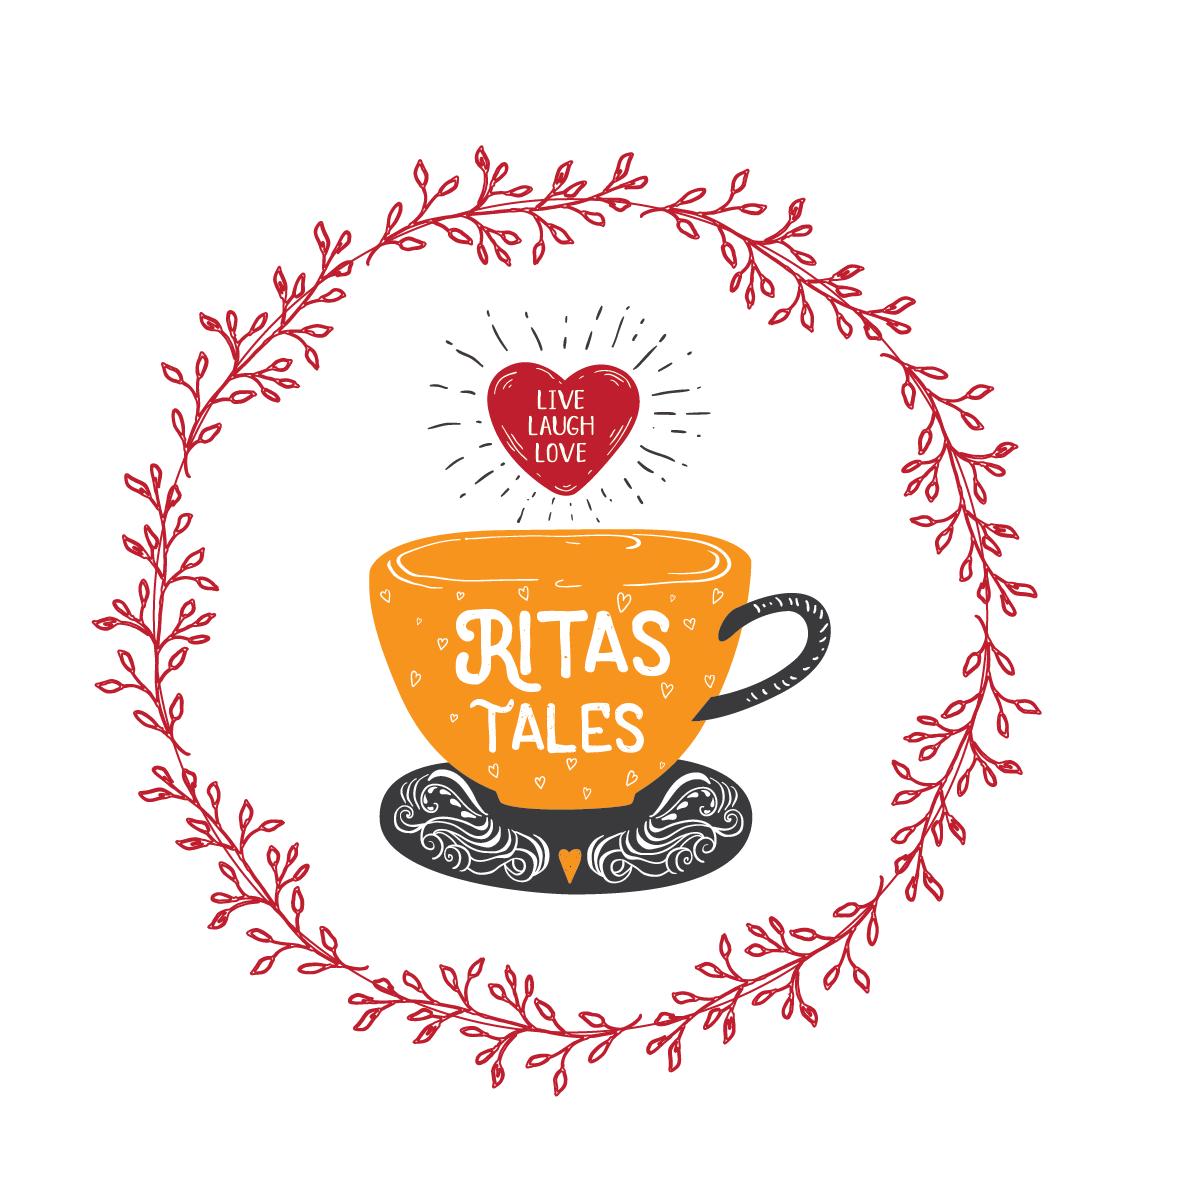 Rita's Tales